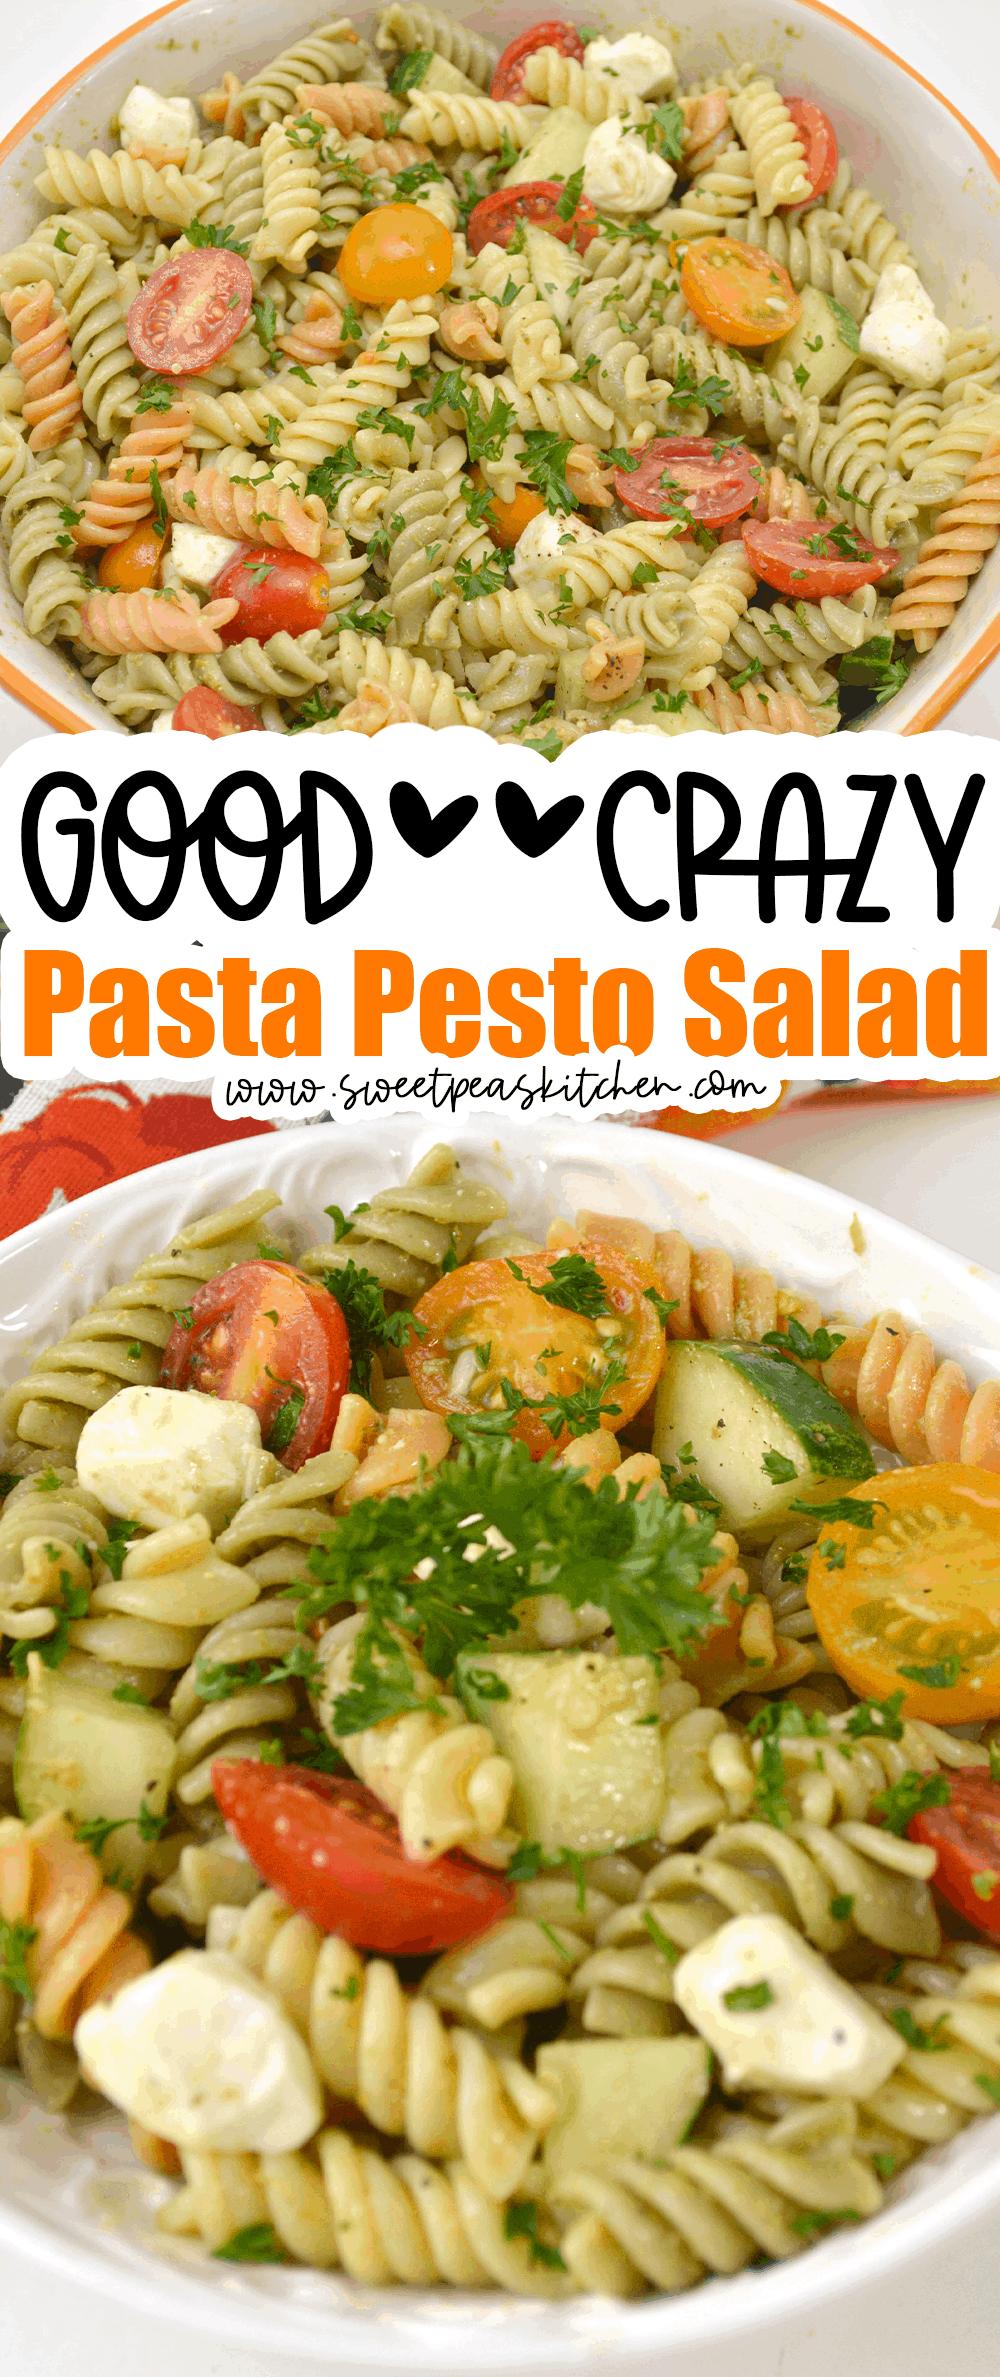 Pasta Pesto Salad